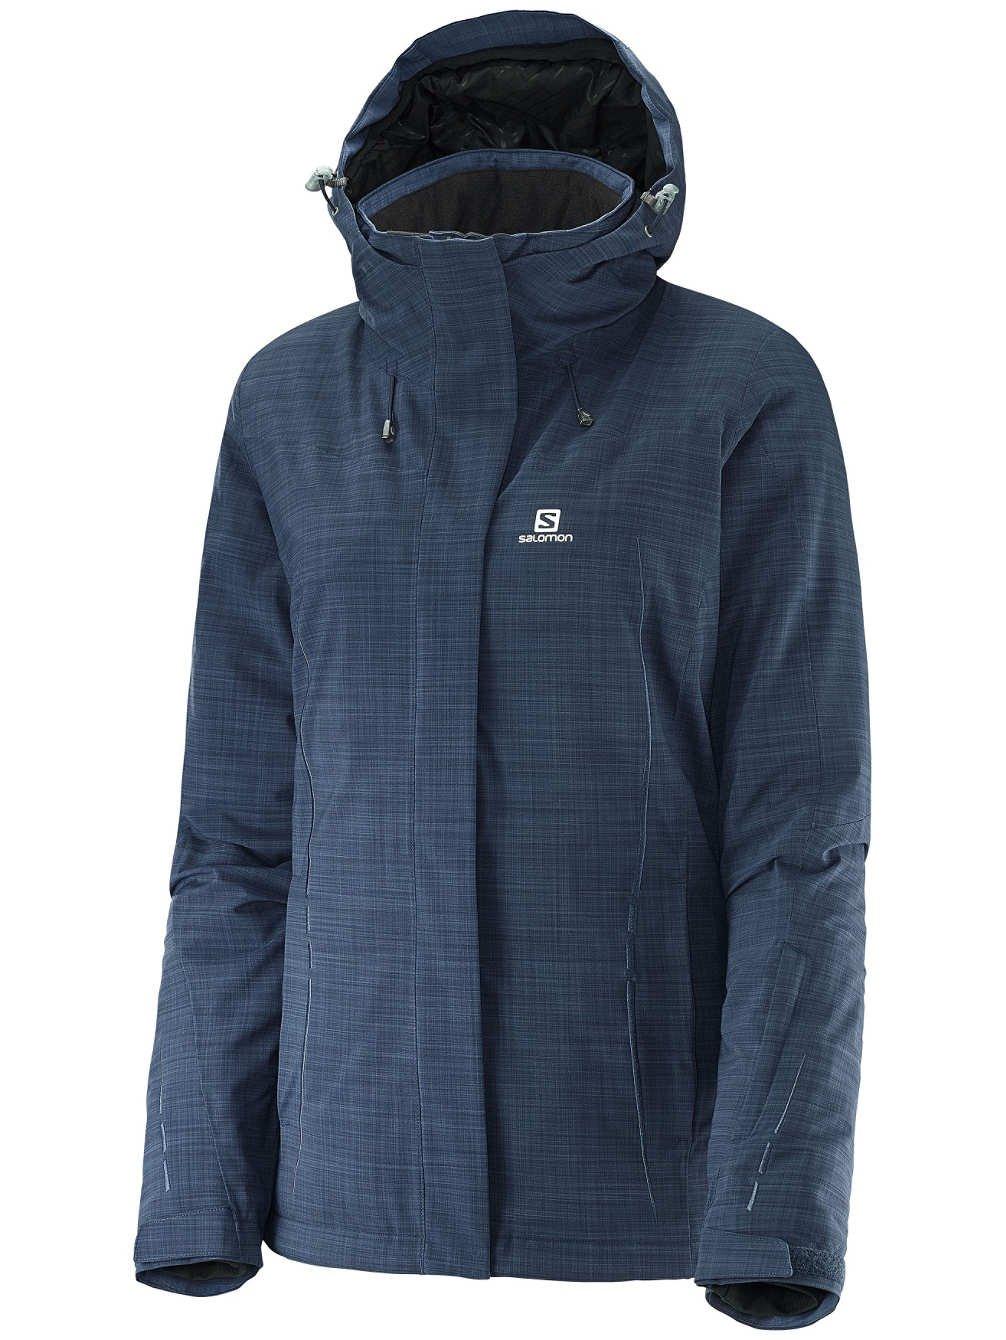 Damen Snowboard Jacke Salomon Icestorm + Jacket günstig